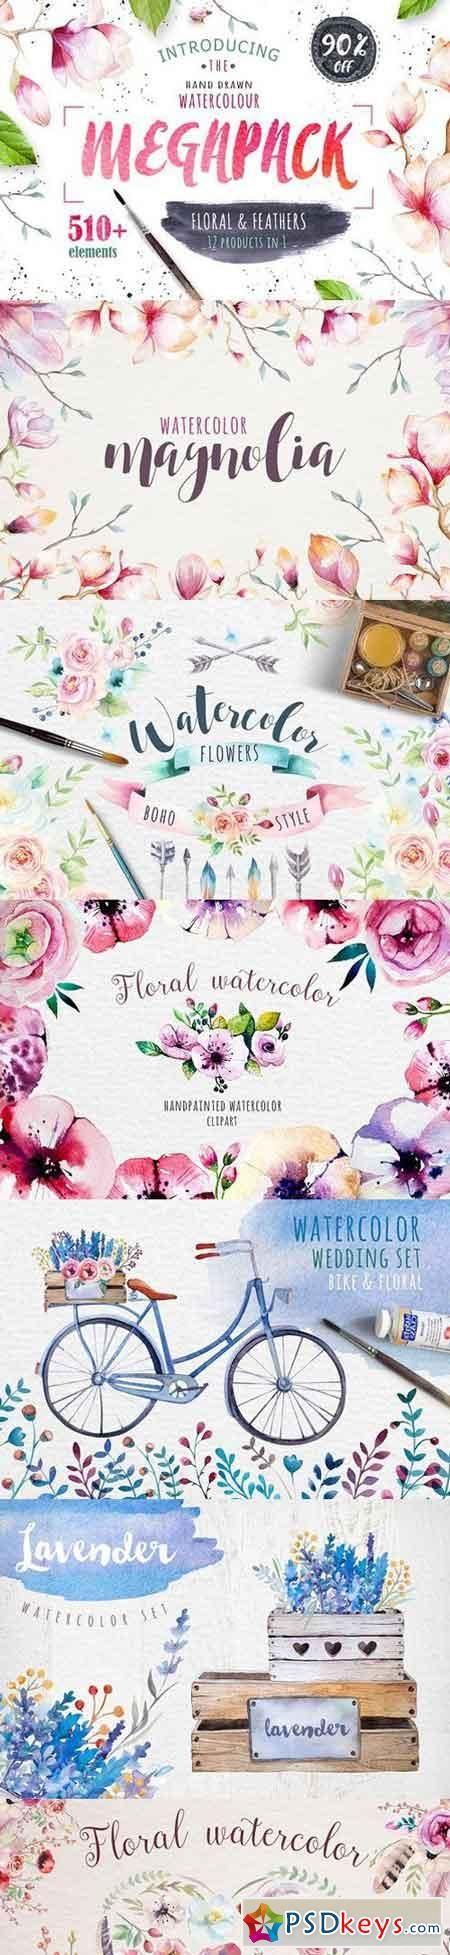 Watercolour MEGAPACK 1021373   PSDkeys   Watercolor, Flowers, Leaves